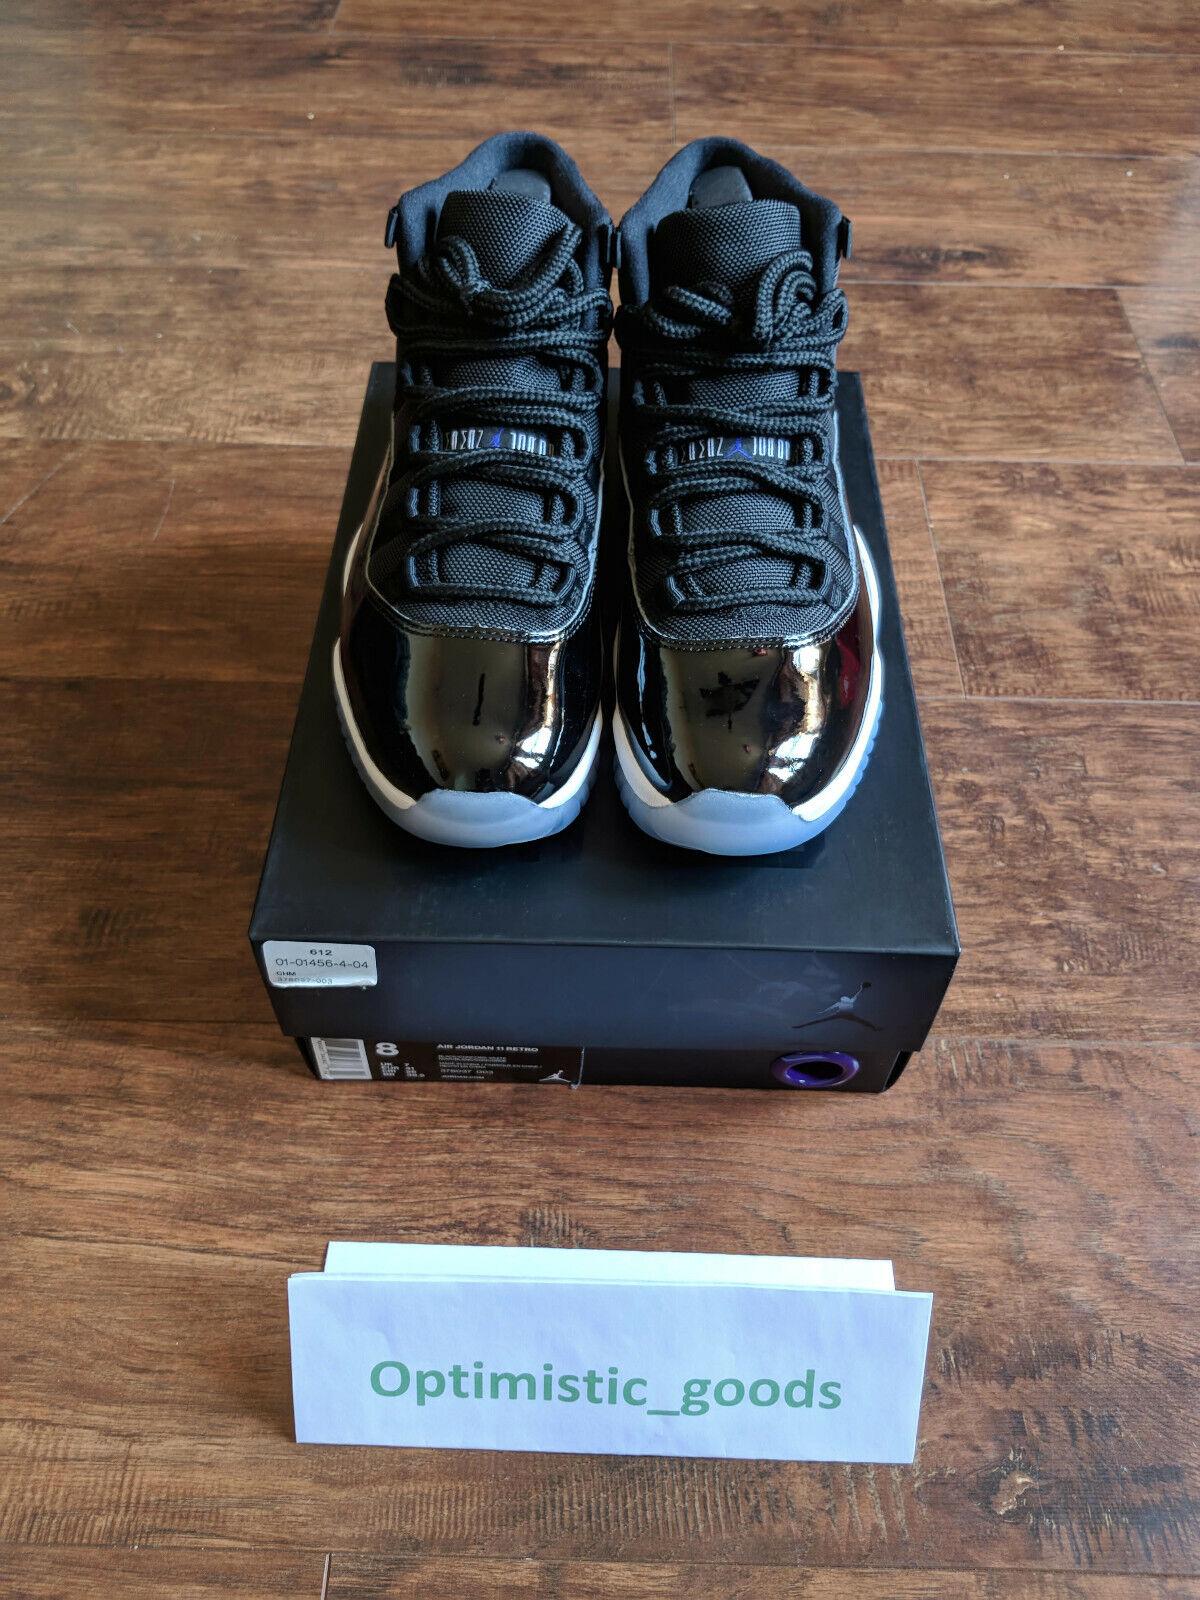 Nike Air Jordan Retro 11 Space Jam Size 8 - Brand New